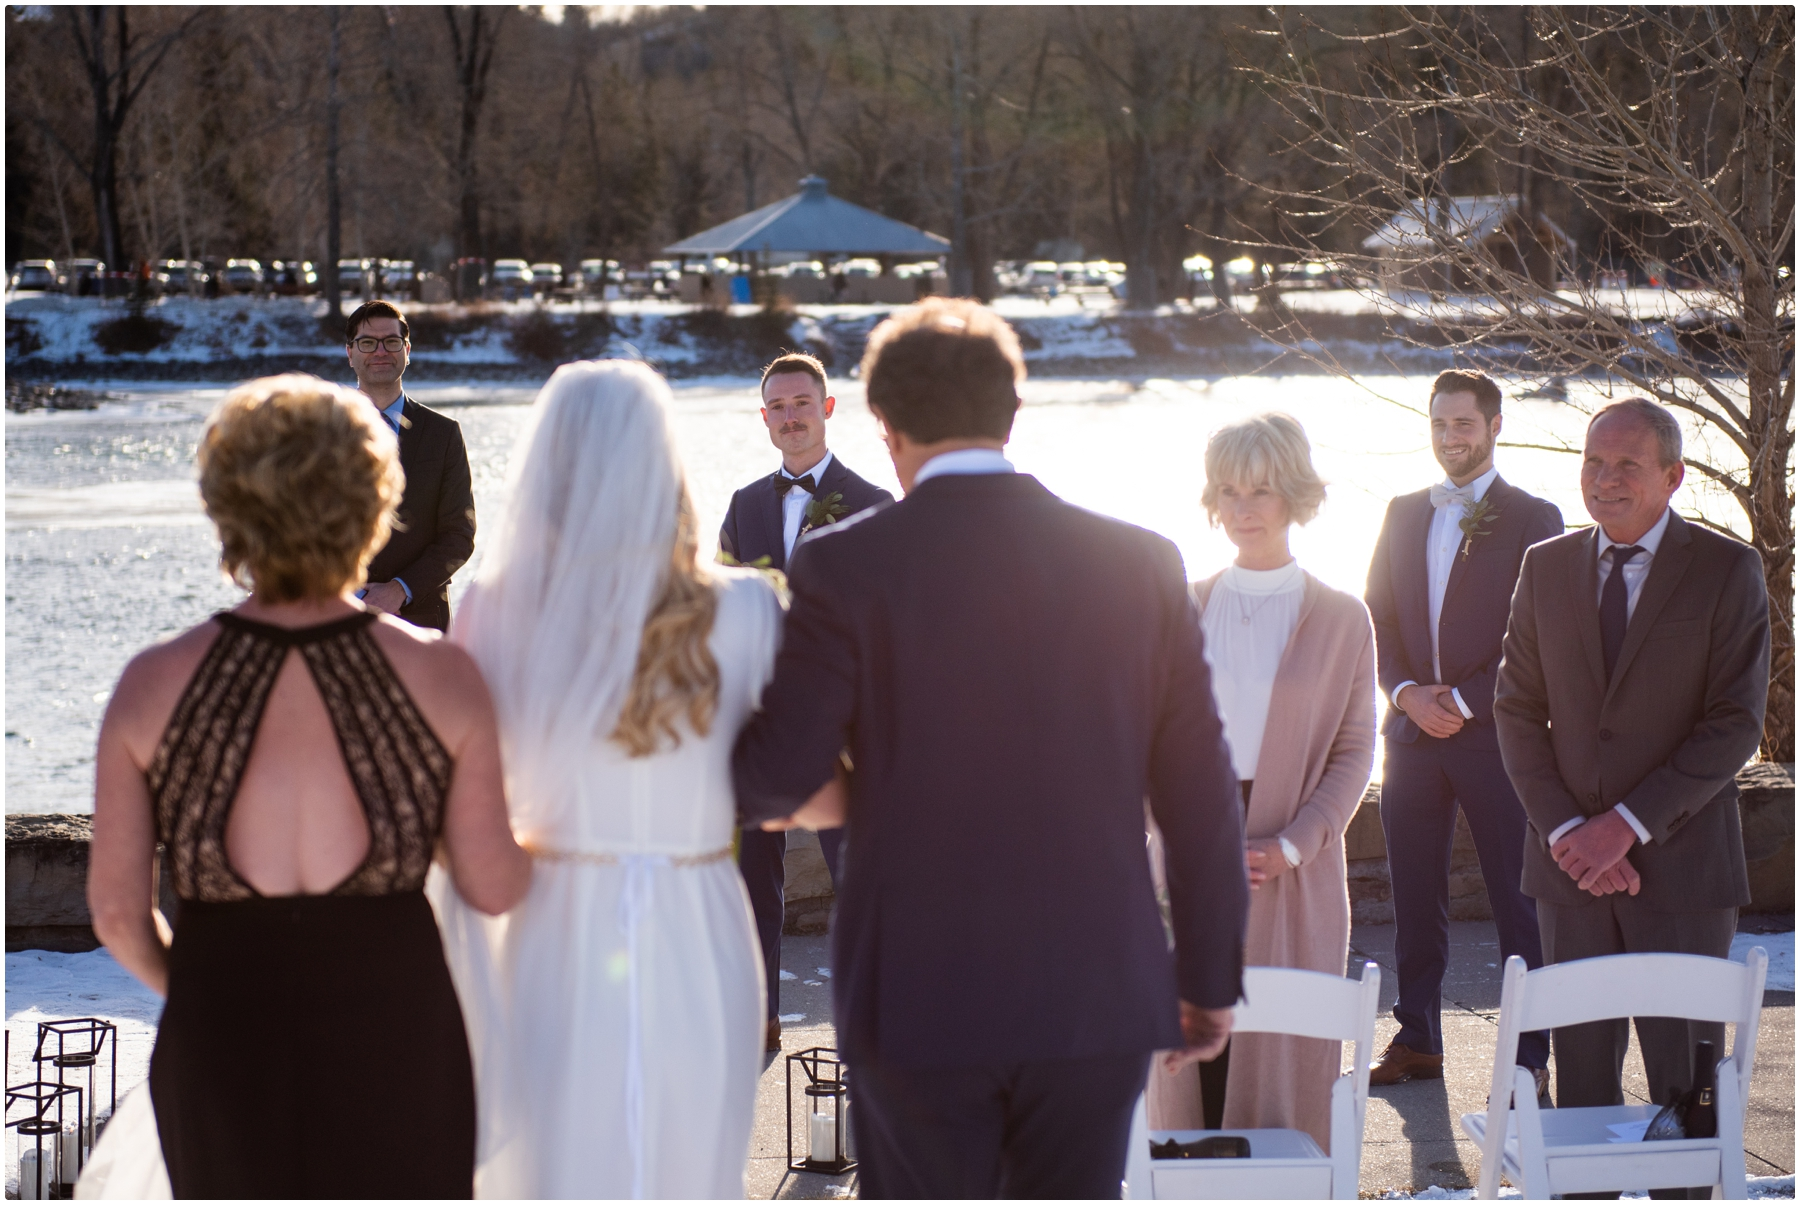 Calgary Outdoor Winter Wedding Ceremony - Baker Park Wedding